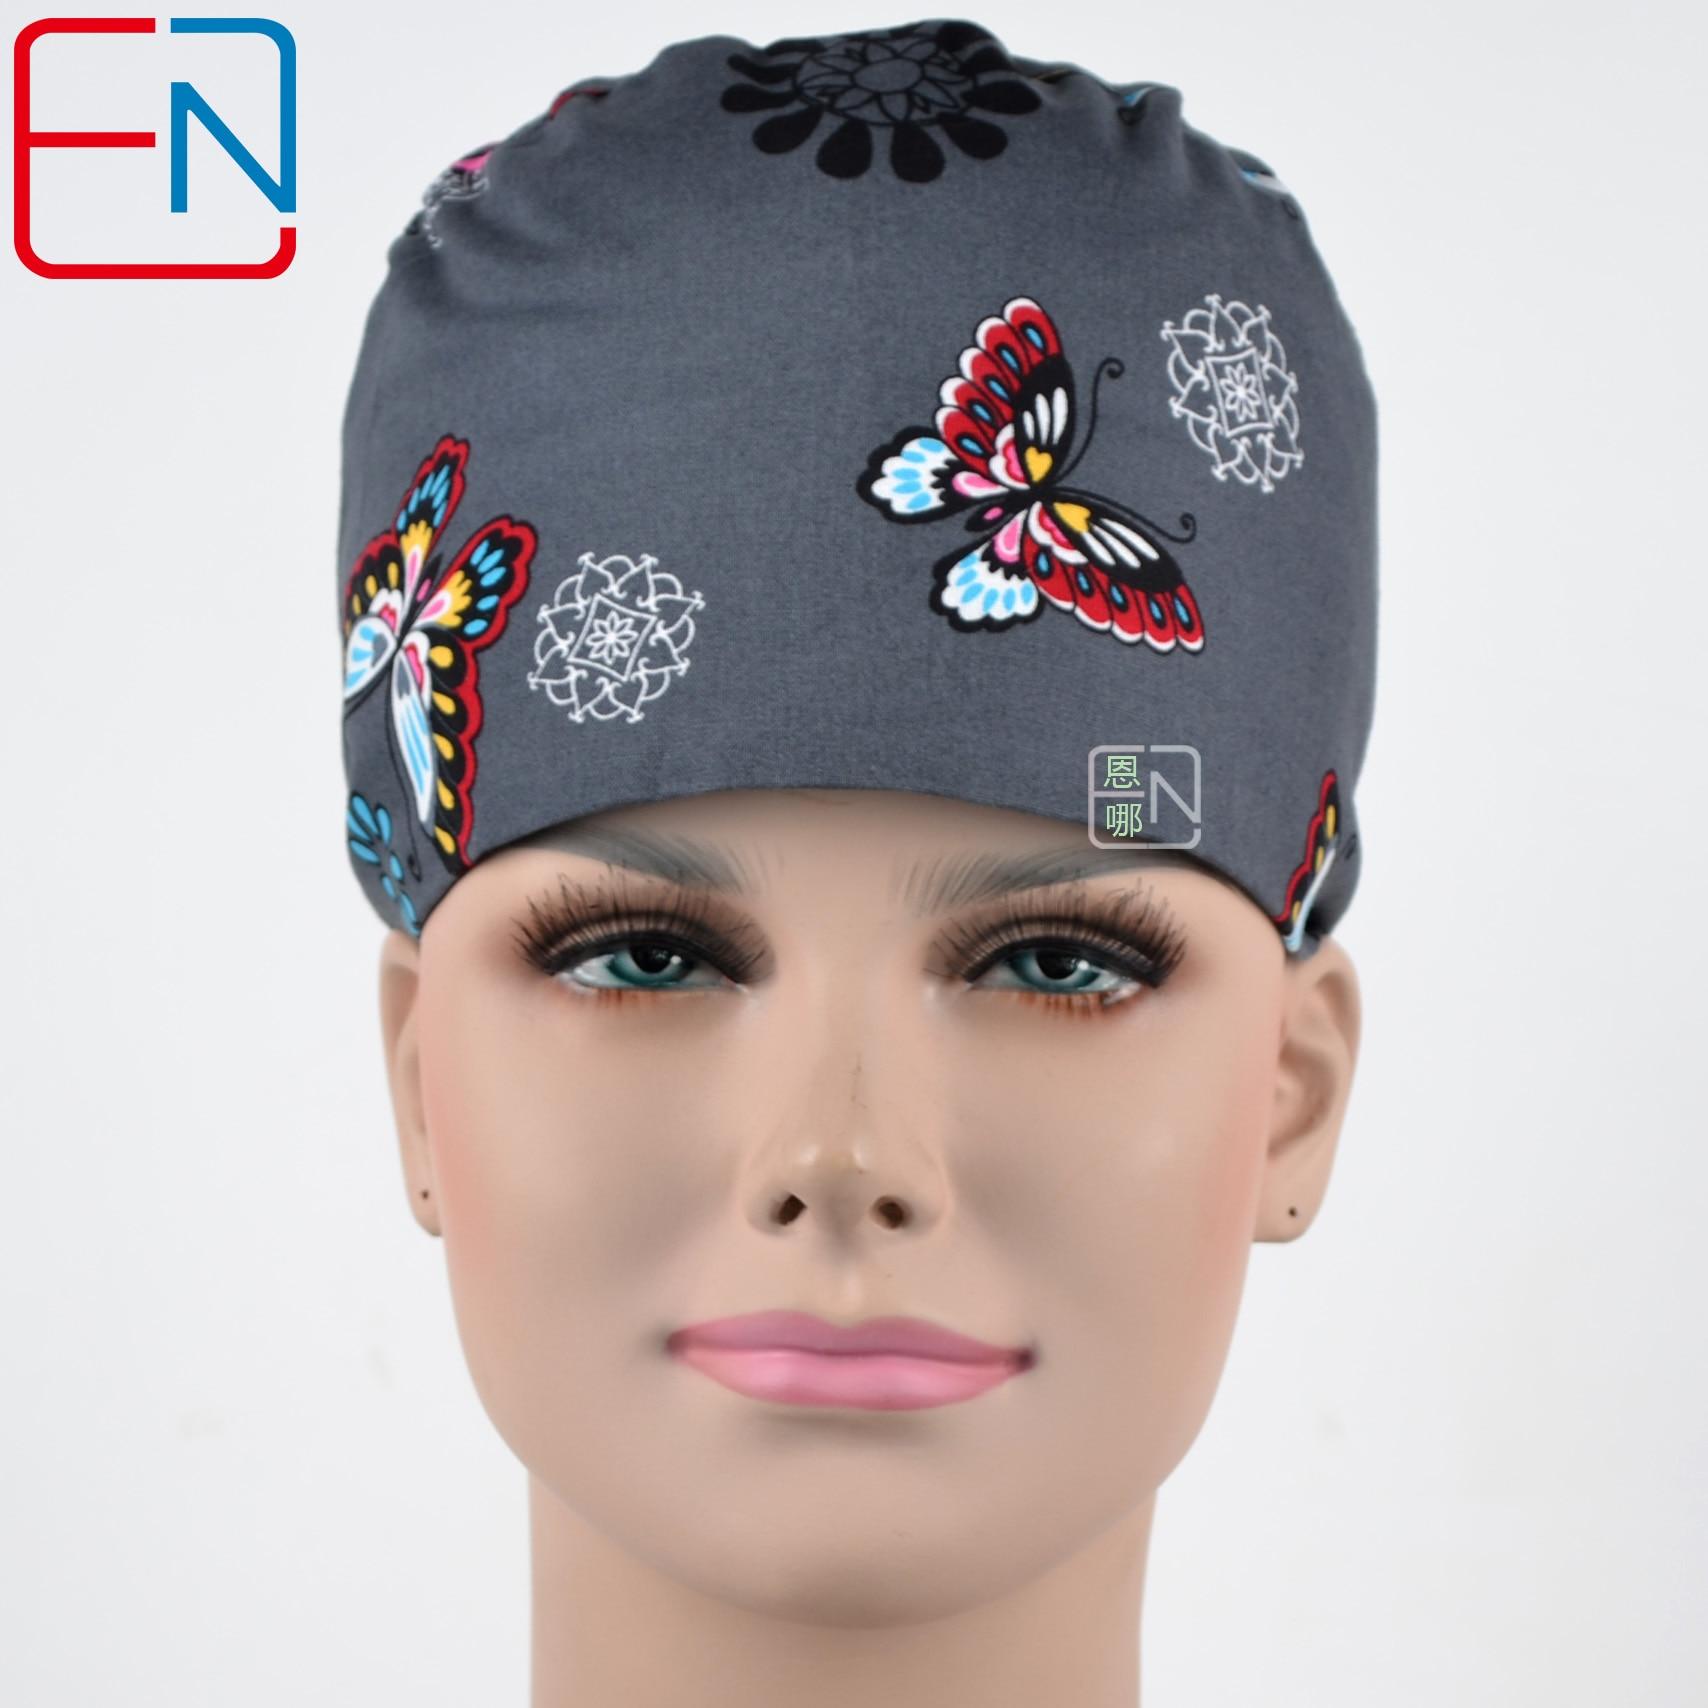 Hennar Womon Scrub Caps Masks 100% Cotton Adjustable Elastic Bands Surgical Scrub Caps Medical Hospital Doctor Headwear Cap Mask